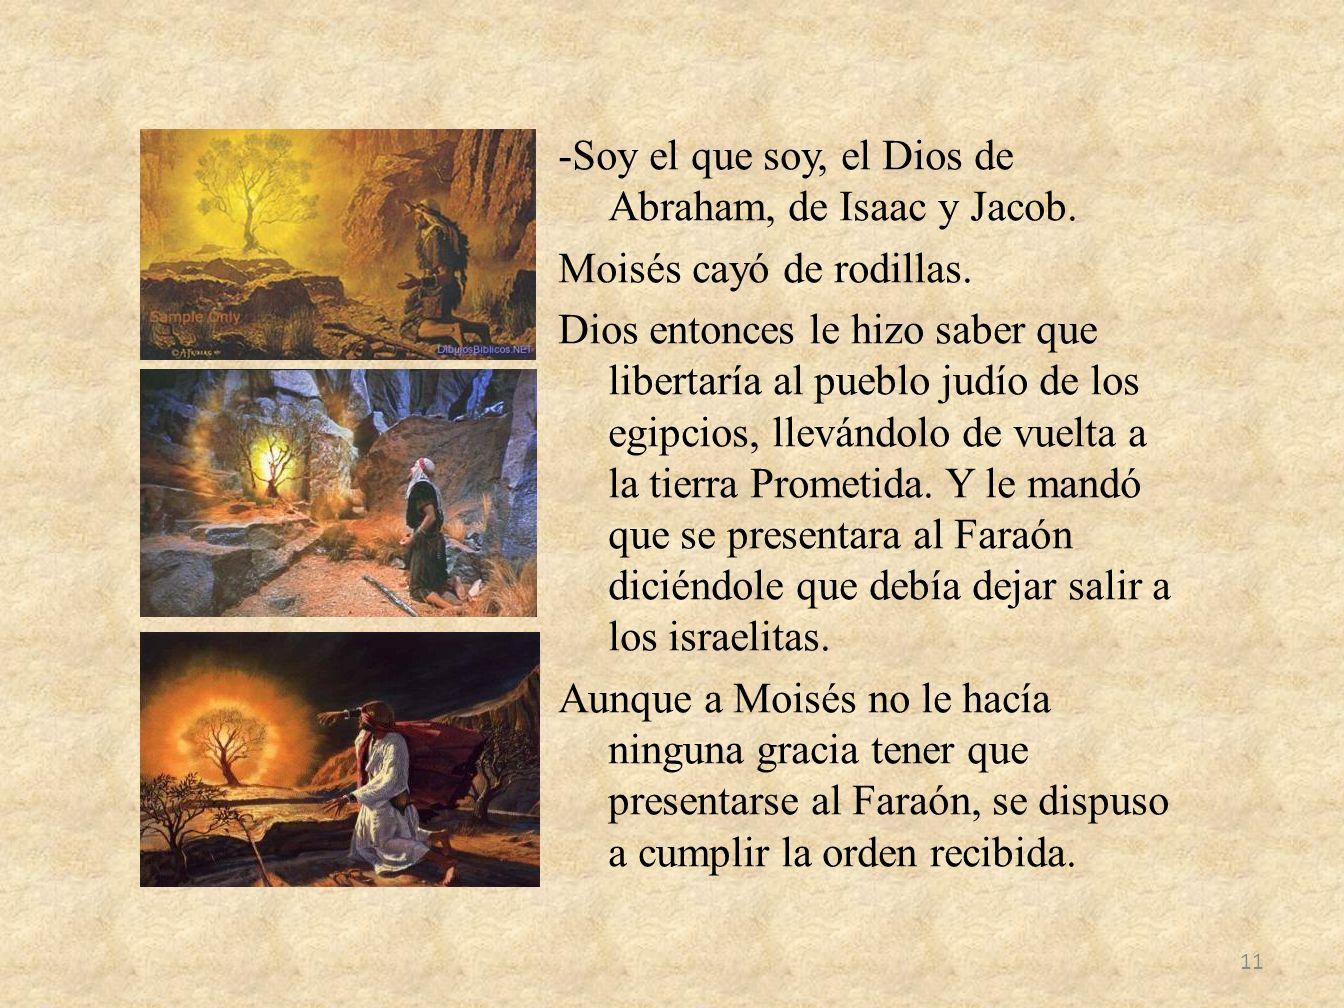 -Soy el que soy, el Dios de Abraham, de Isaac y Jacob